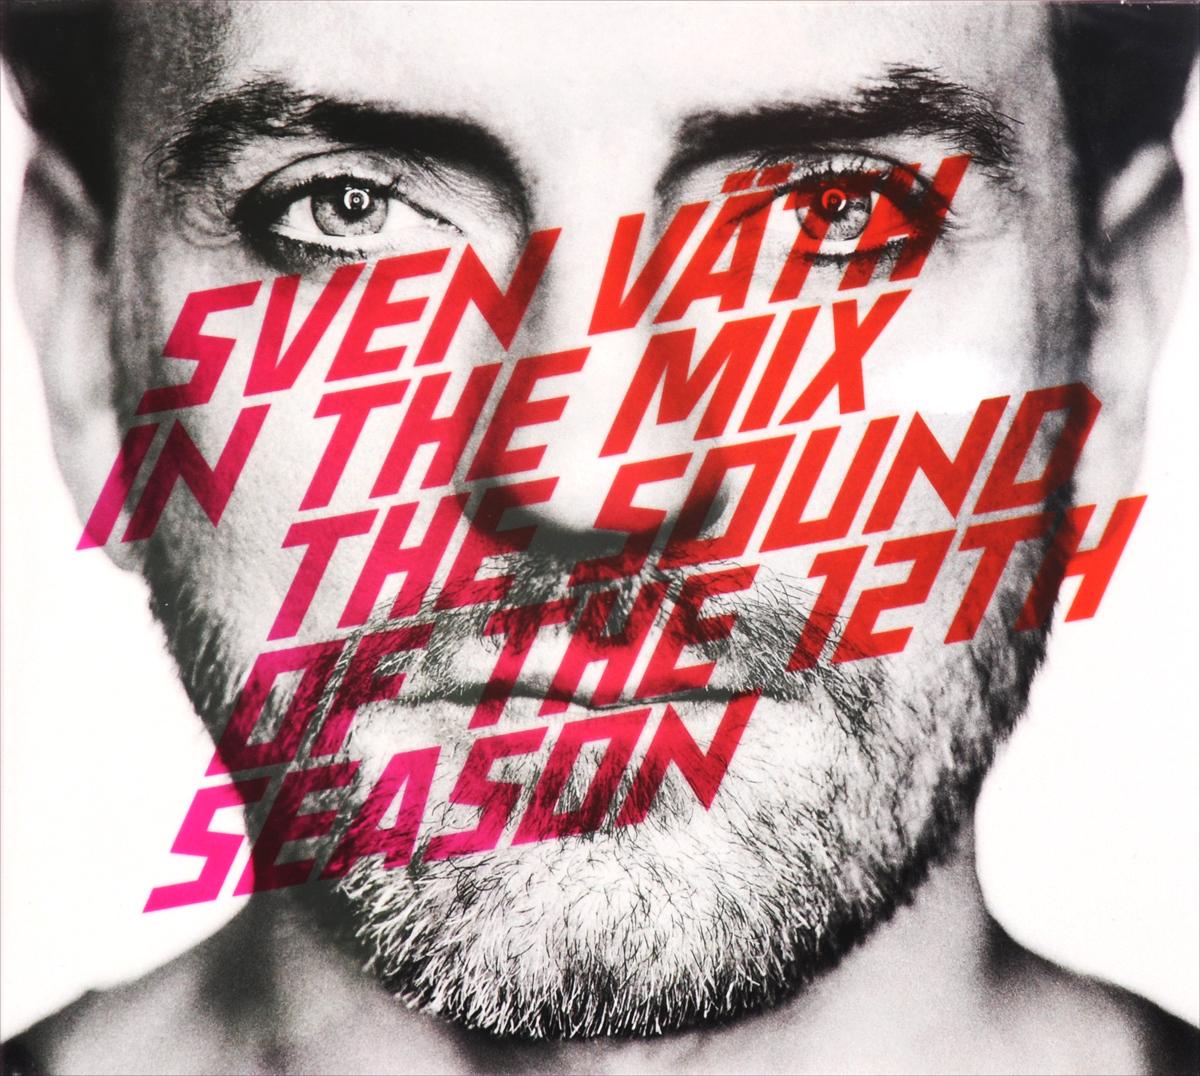 где купить Sven Vath. In The Mix. The Sound Of The 12th Season. Premium Edition (2 CD) по лучшей цене